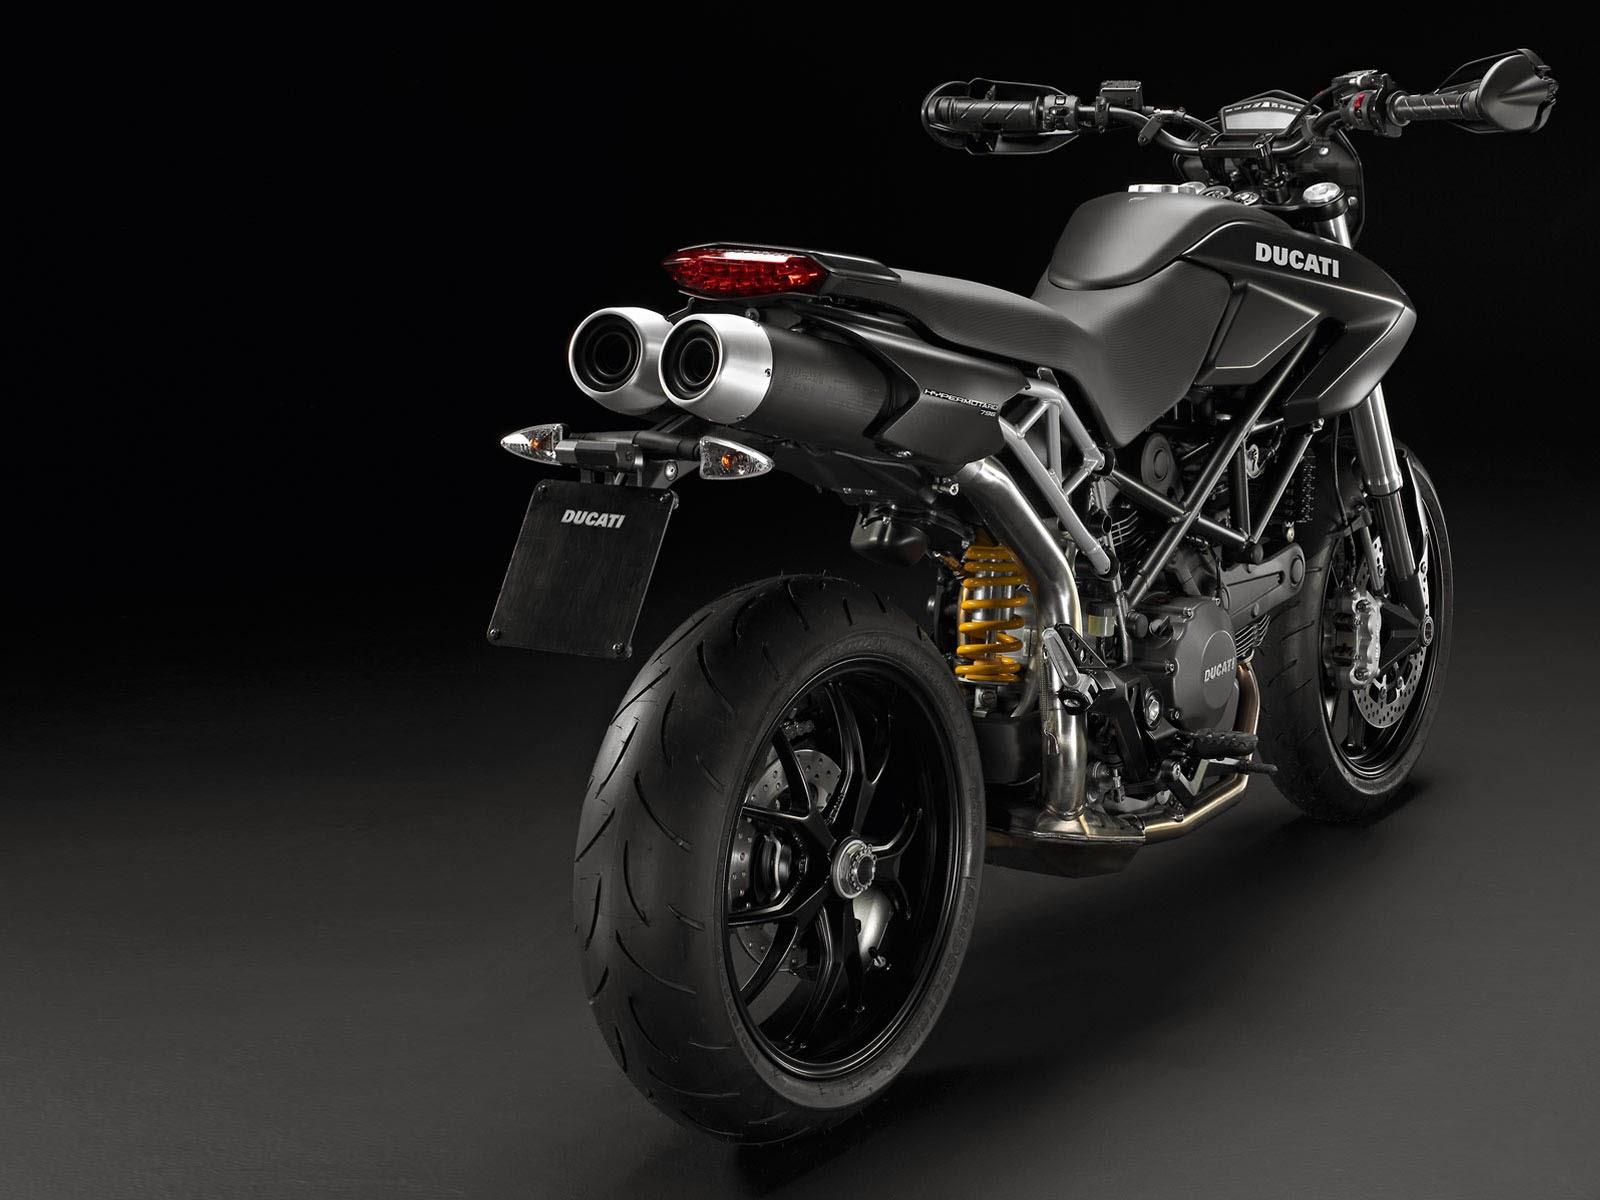 3d Yamaha Wallpaper Wallpapers Ducati Hypermotard 796 Wallpapers